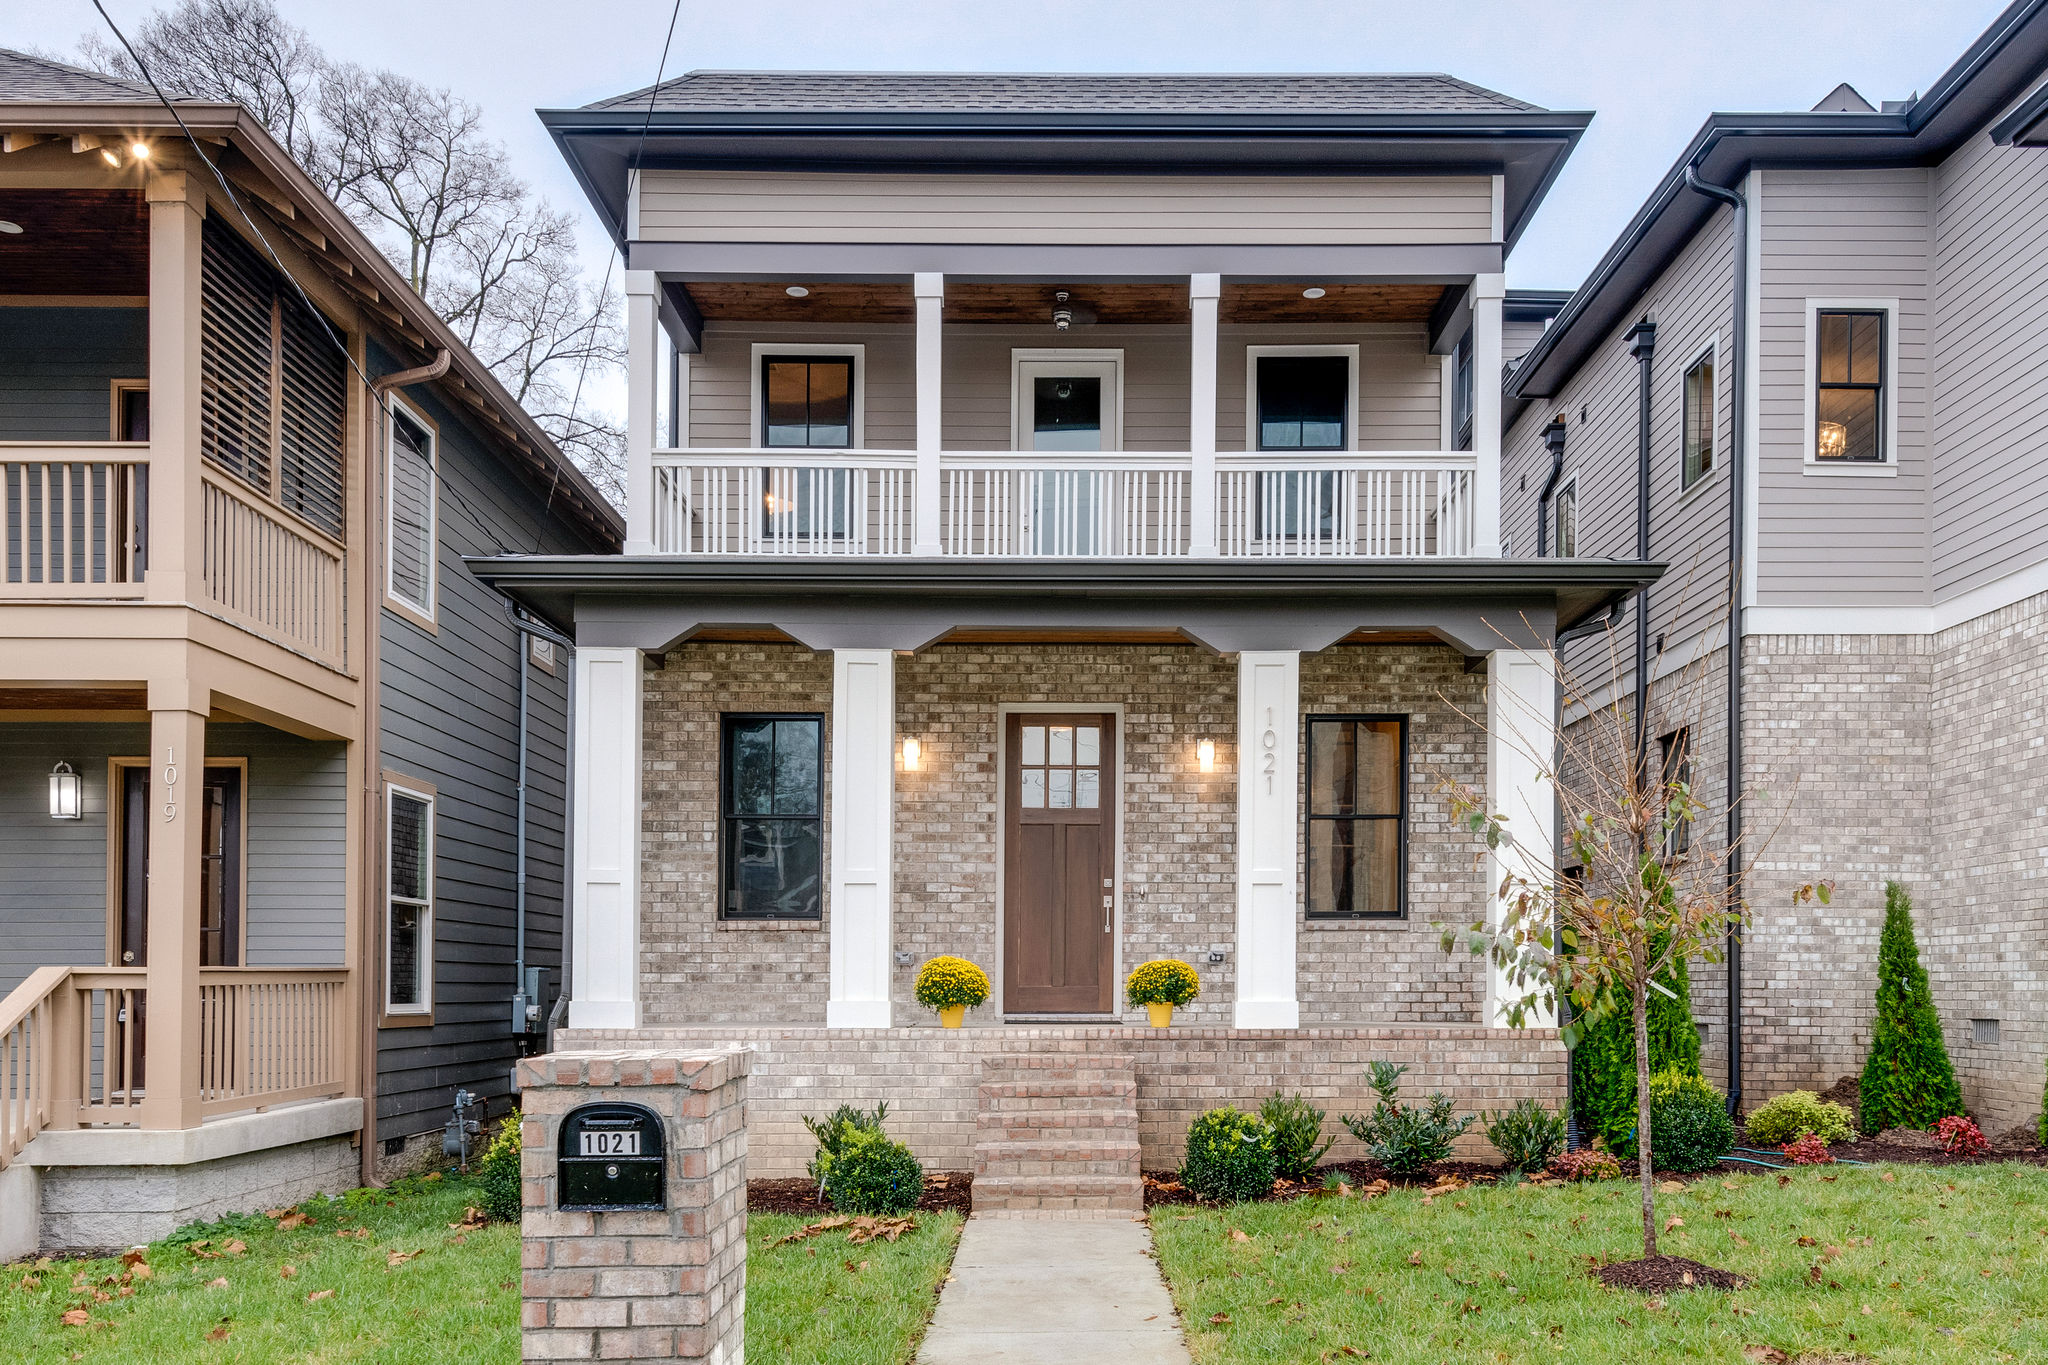 Hart Love Builders - Nashville Tennessee - 1021 10th Avenue North